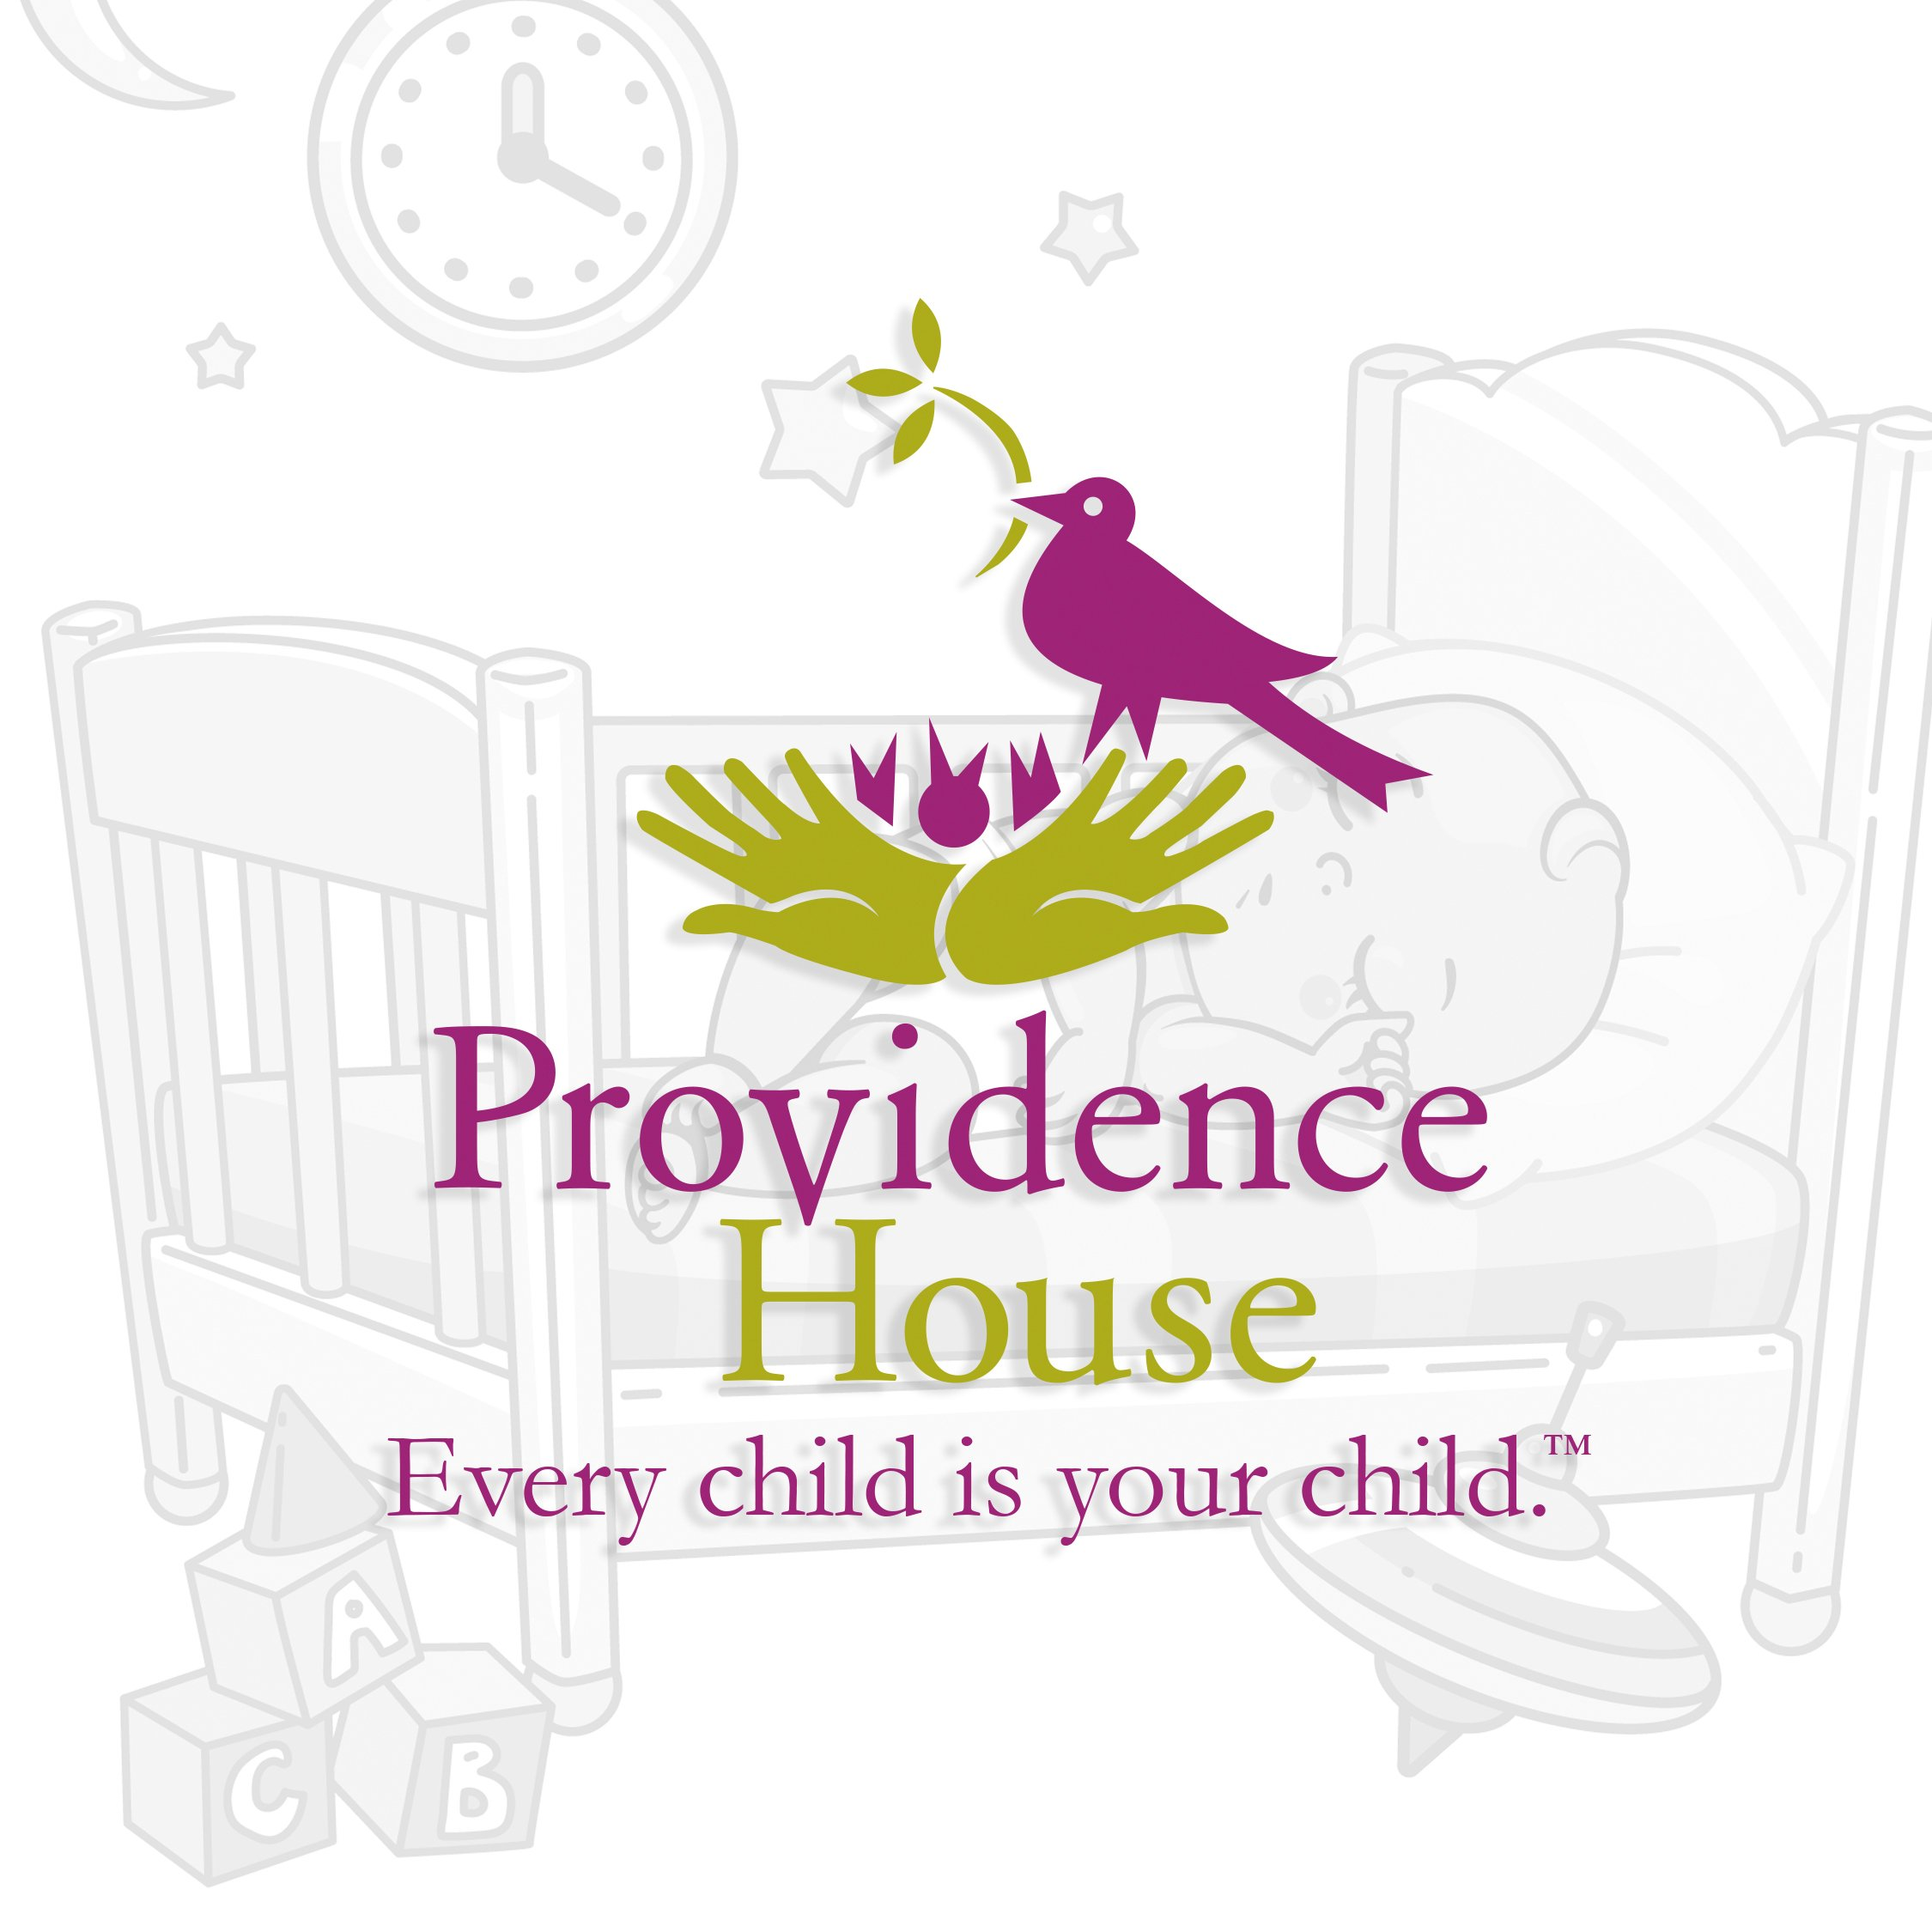 Providence House LOGO Redesign